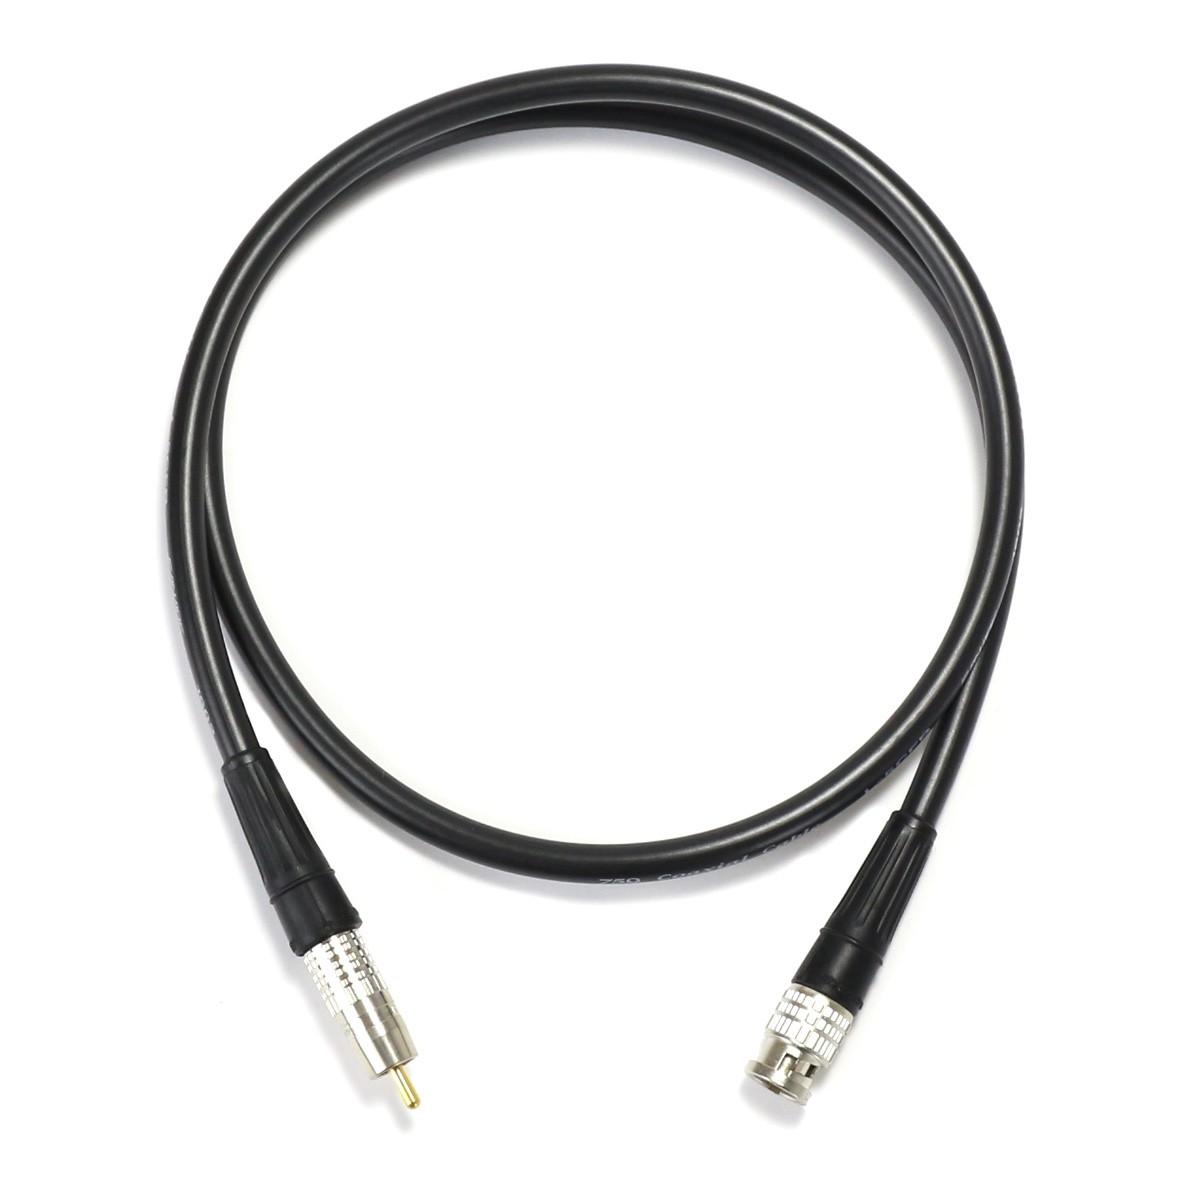 Canare Cable Numerique Coaxial 75 Ohm Bnc Rca 1m